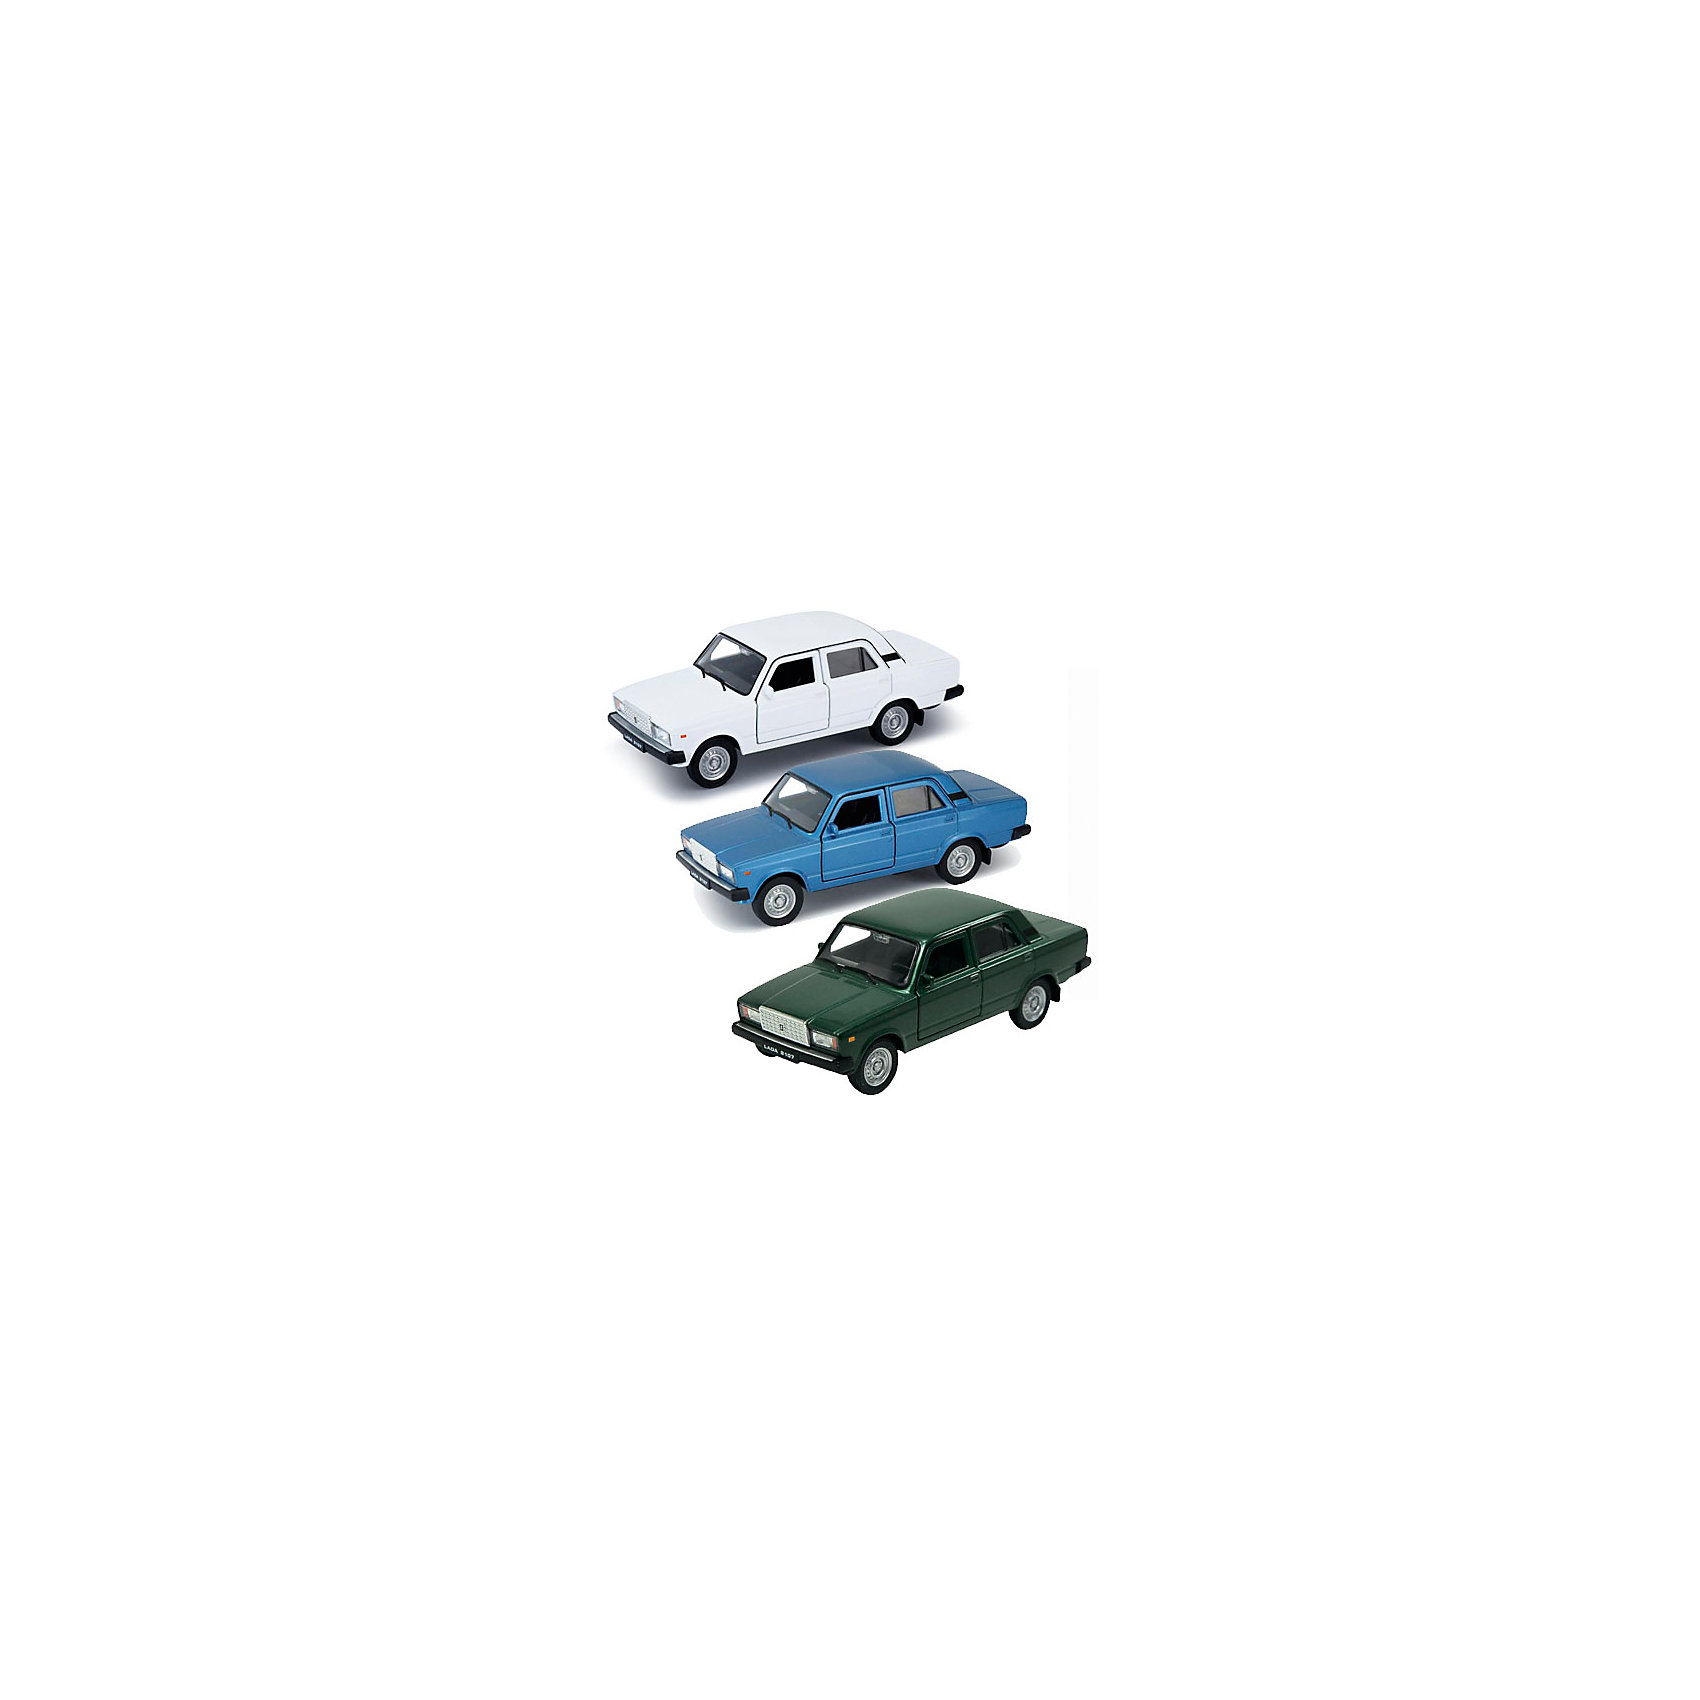 Модель машины  1:34-39 LADA 2107, зеленая, Welly<br><br>Ширина мм: 60<br>Глубина мм: 115<br>Высота мм: 145<br>Вес г: 161<br>Возраст от месяцев: 36<br>Возраст до месяцев: 2147483647<br>Пол: Мужской<br>Возраст: Детский<br>SKU: 5255019